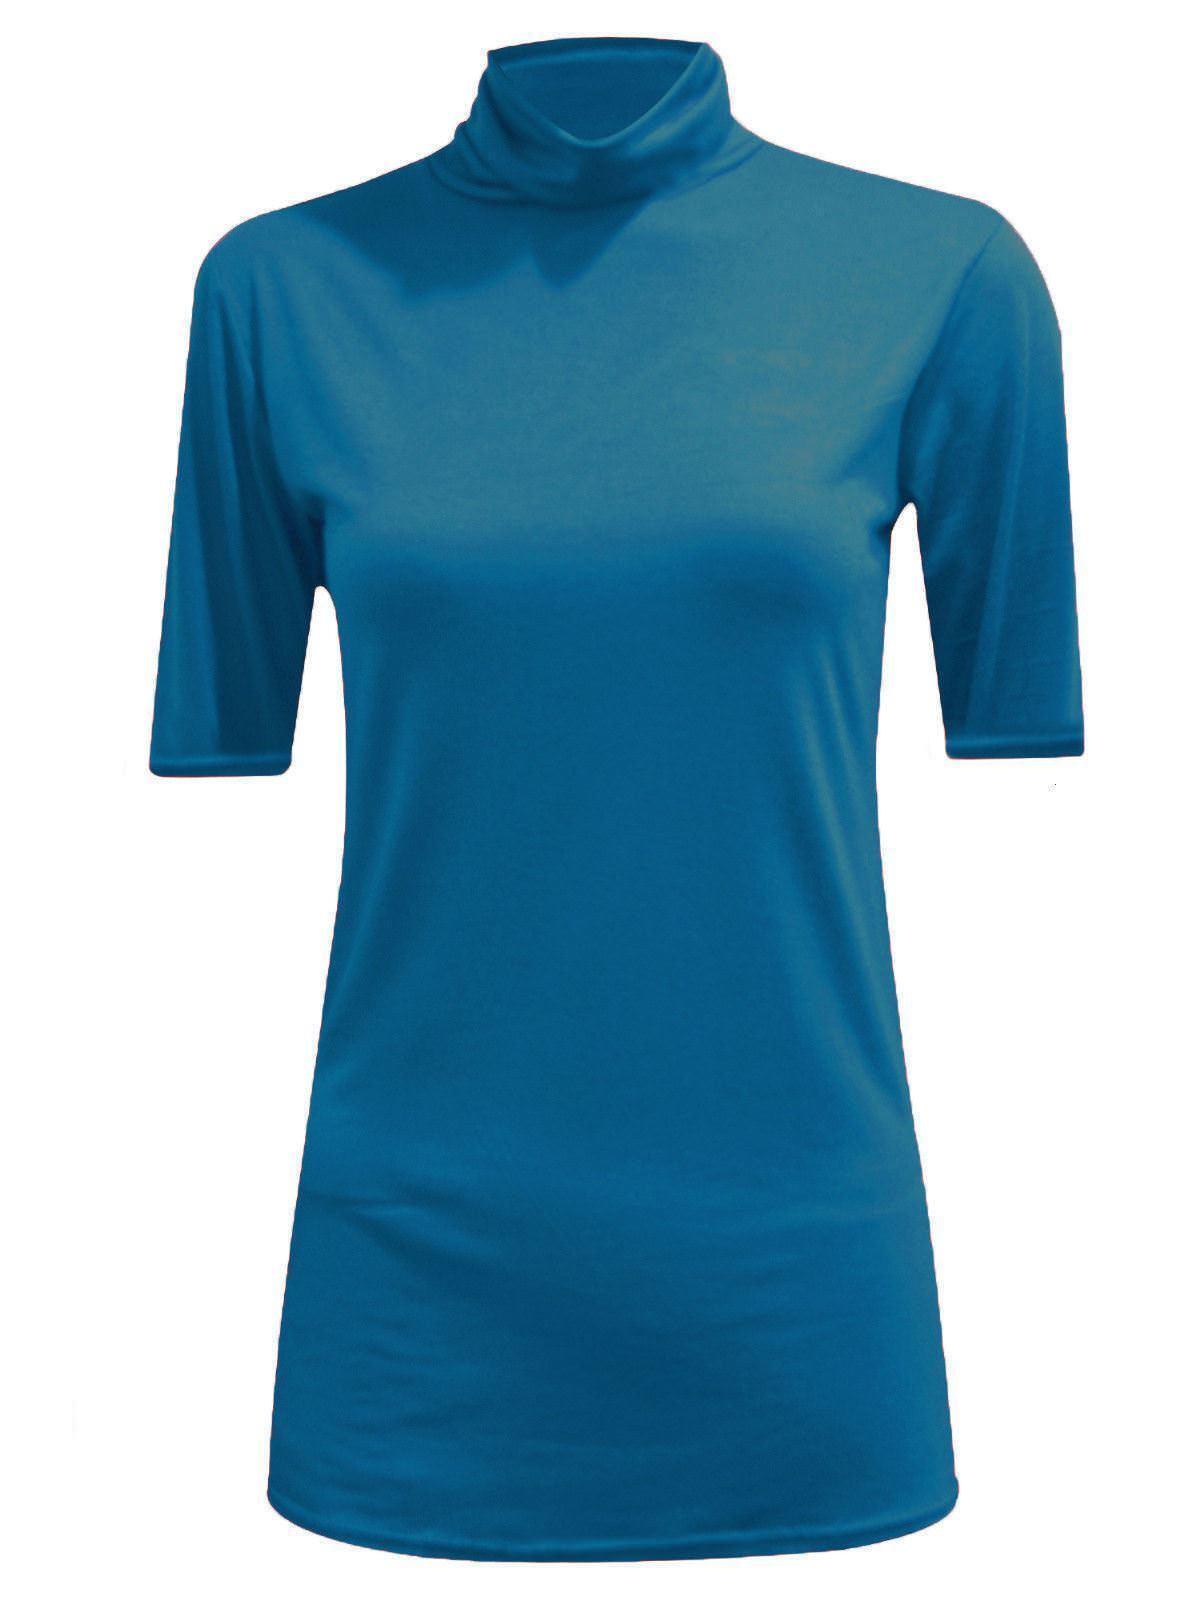 Jaggy camicia E in Blu E camicia Bianco Tartan A righe XXL RRP .99 1f0bb4